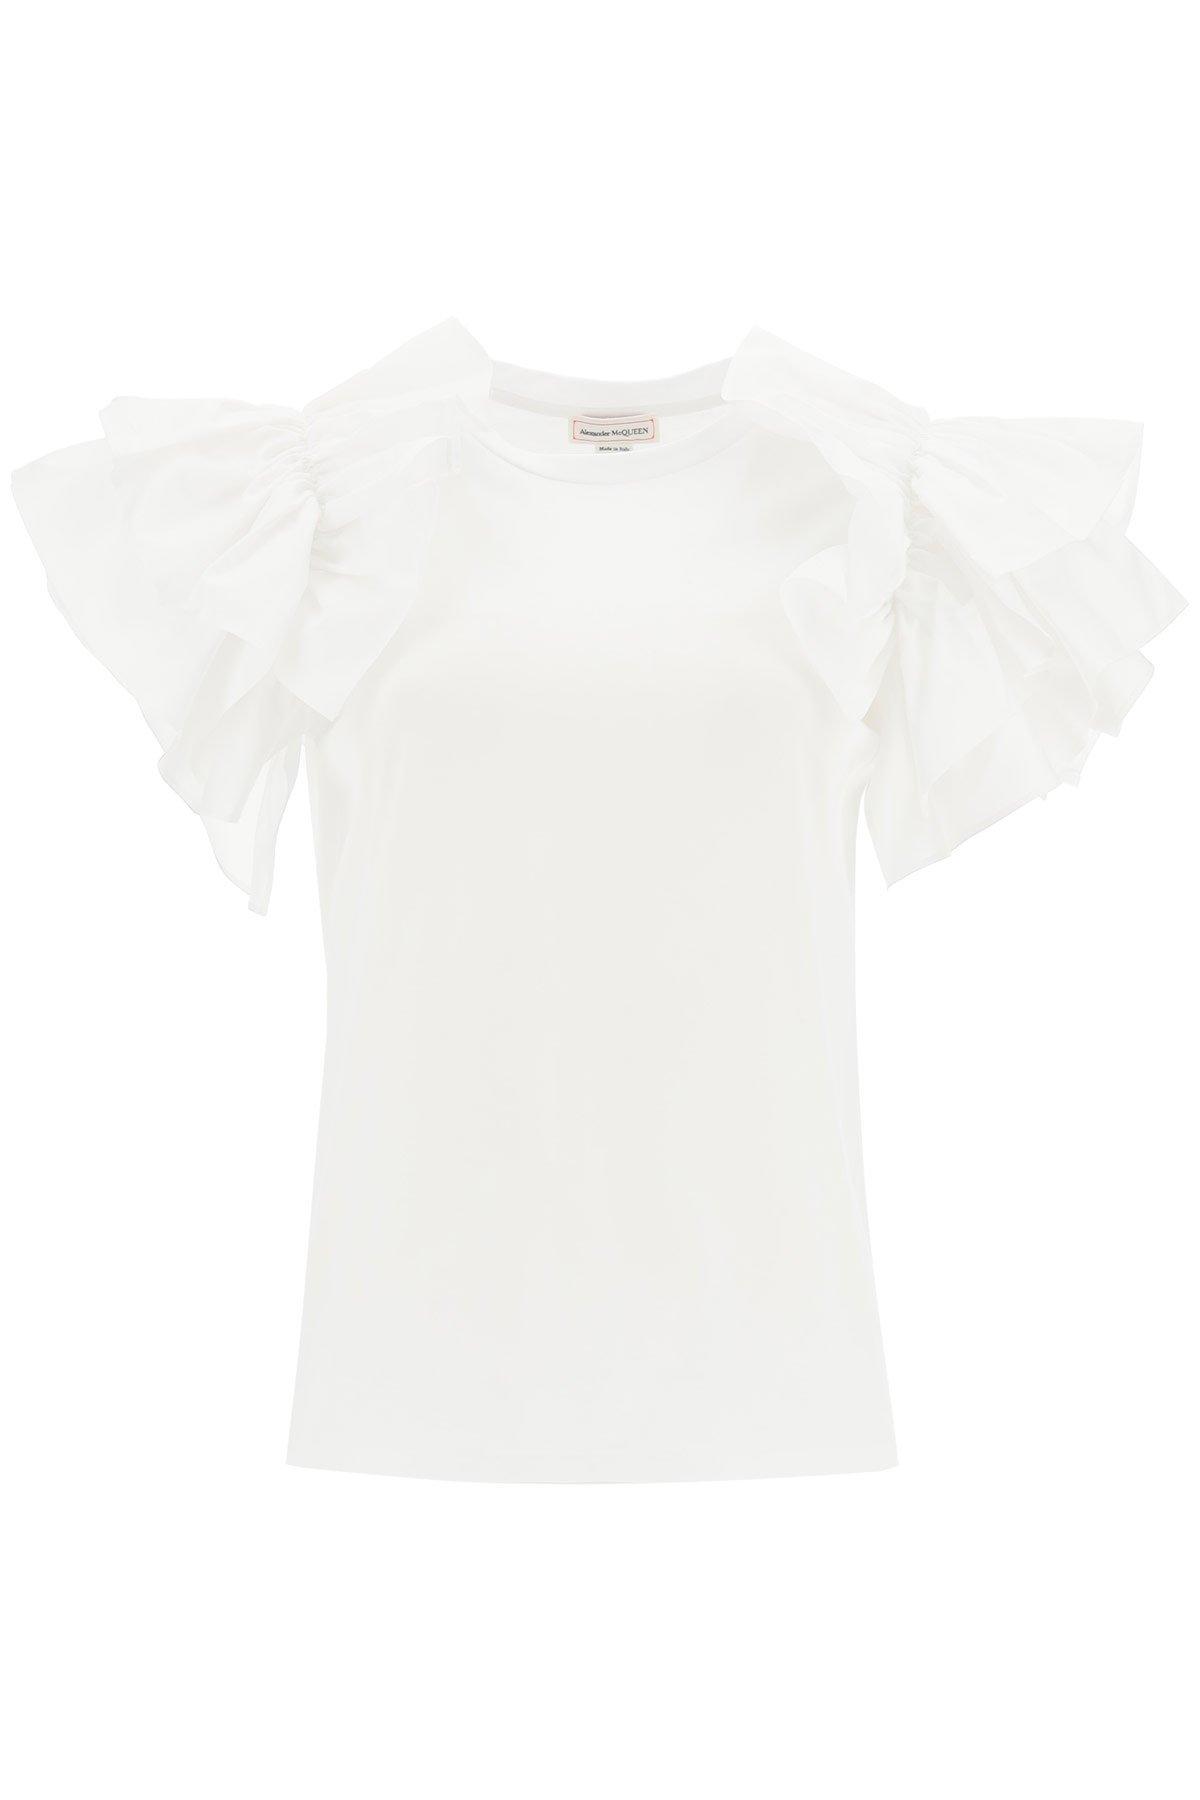 Alexander mcqueen t-shirt con volant